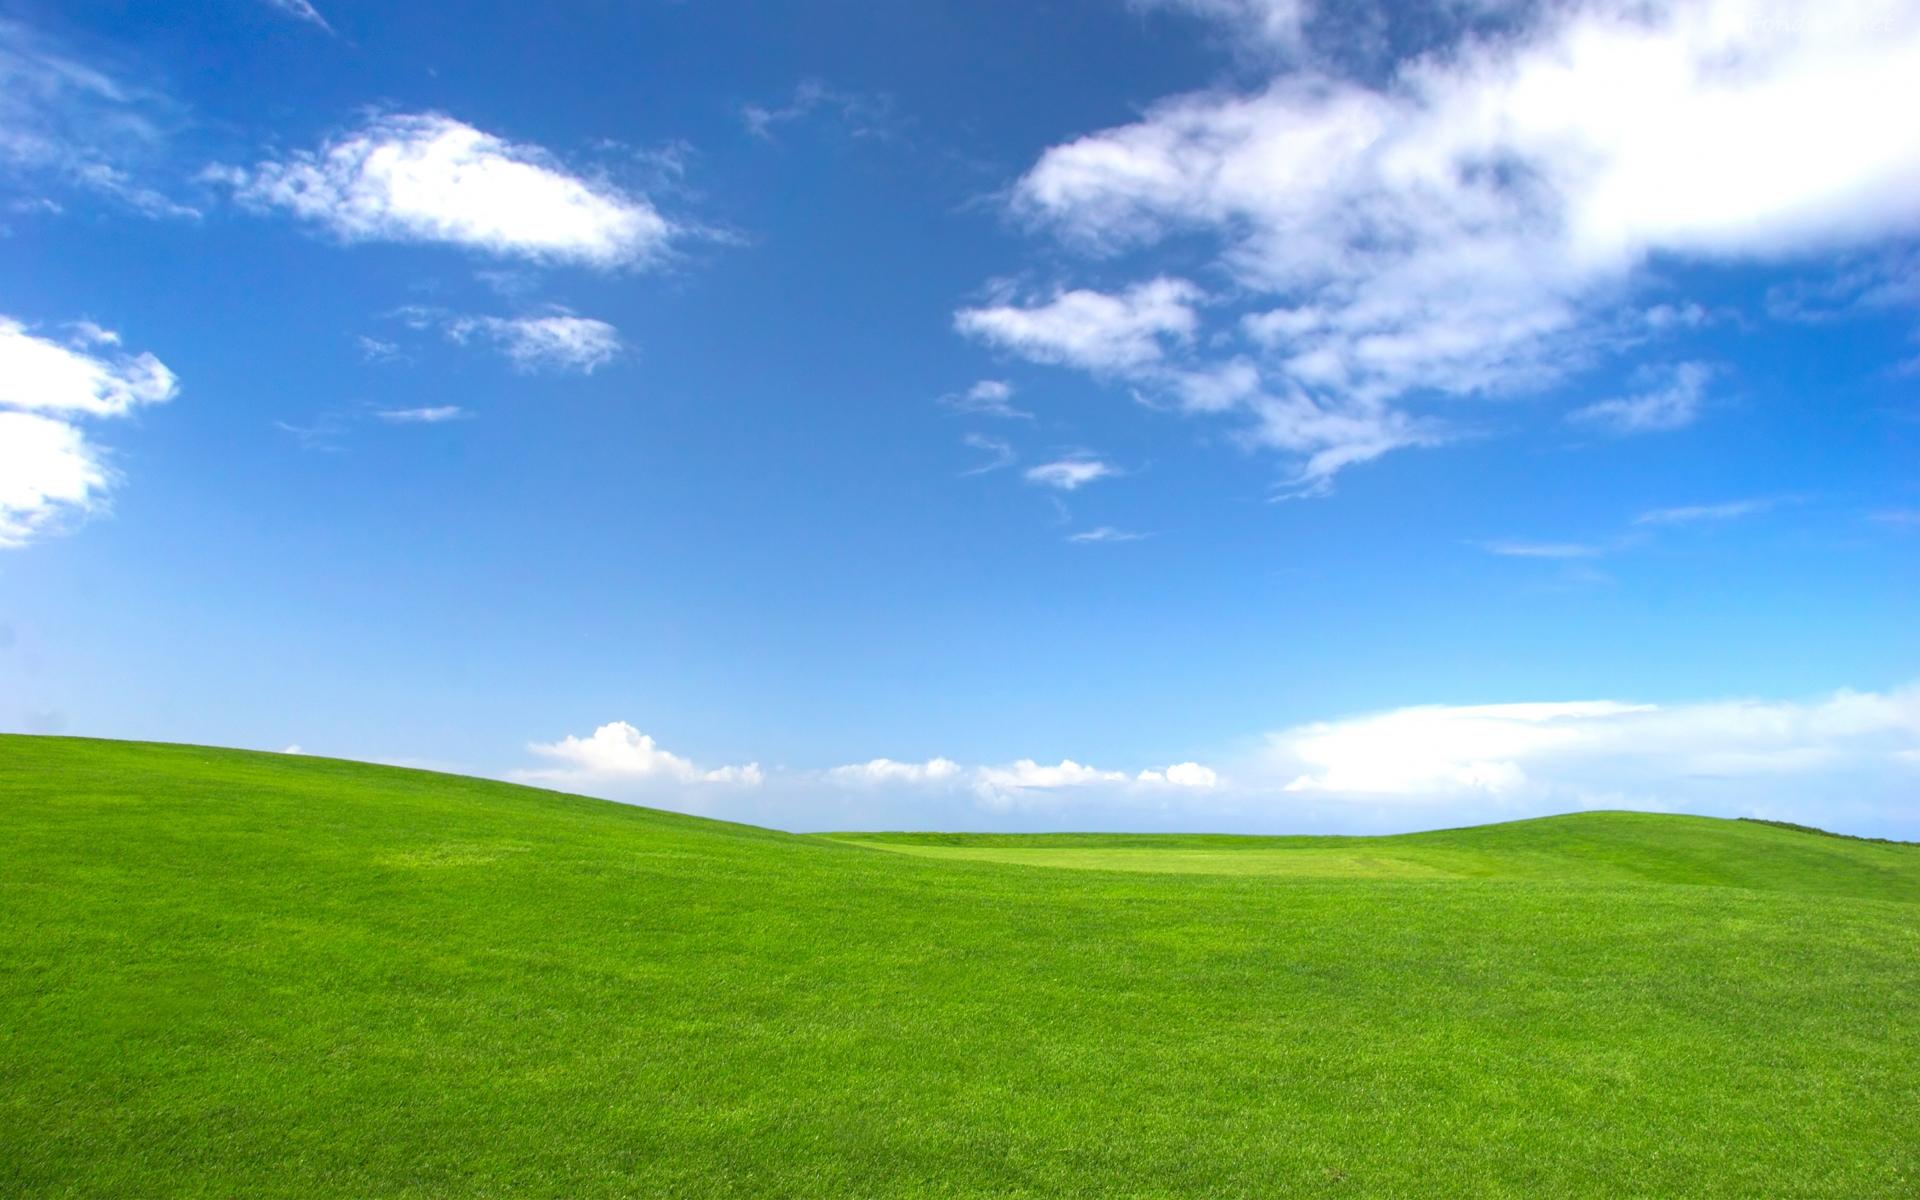 Descargar Fondos de pantalla el paisajes de windows hd widescreen 1920x1200